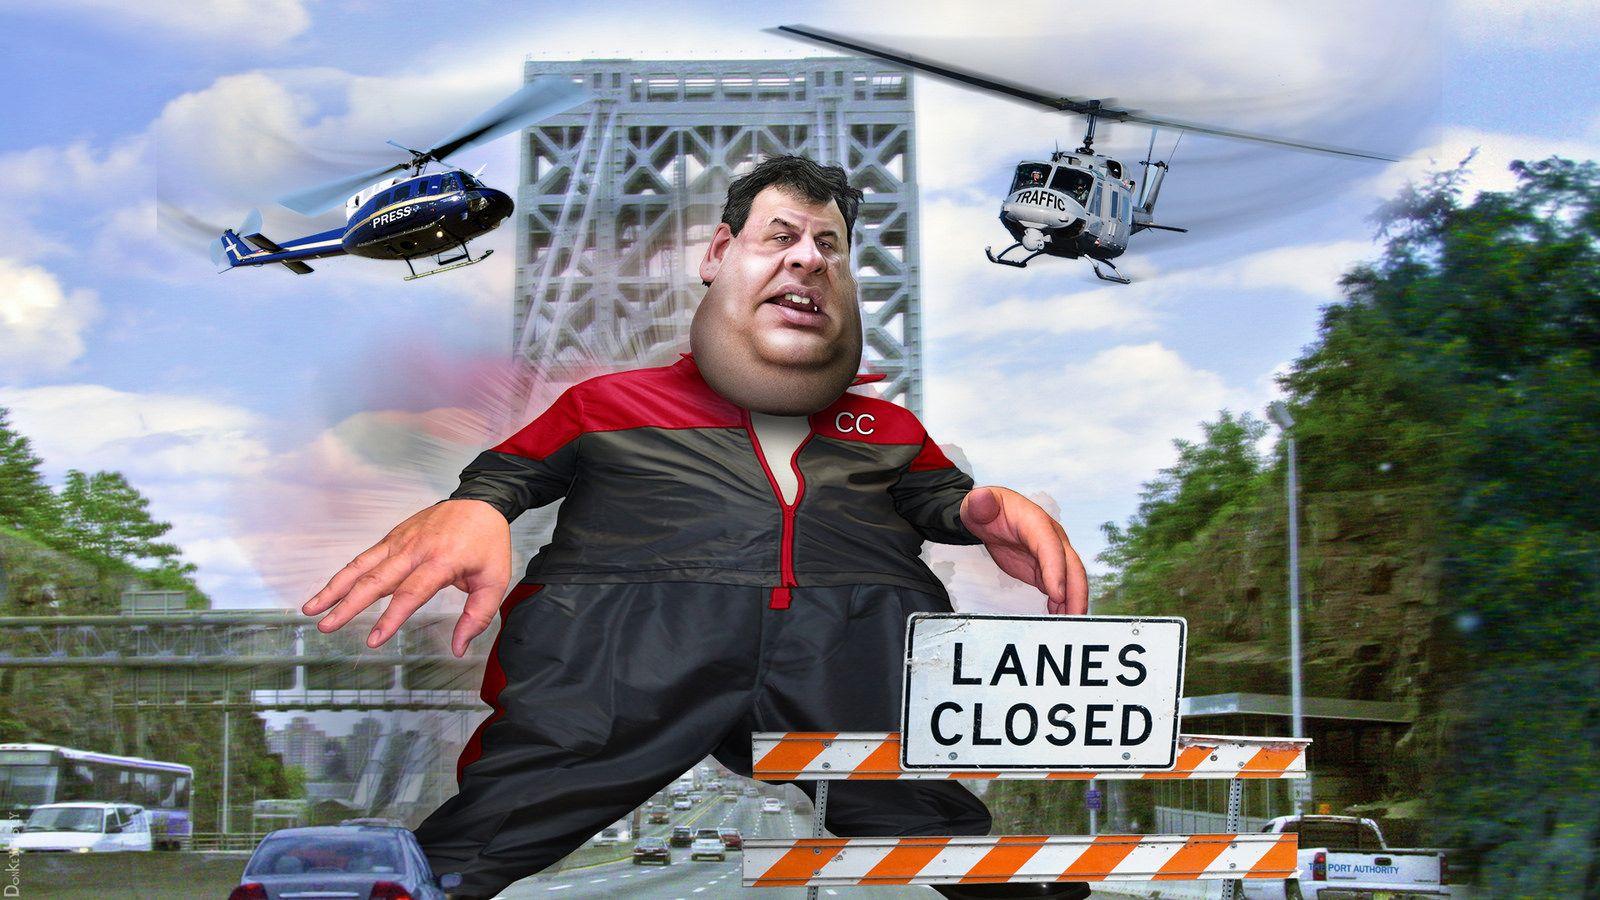 Chris Christie - Bridge Gate   Chris christie and Gov chris christie